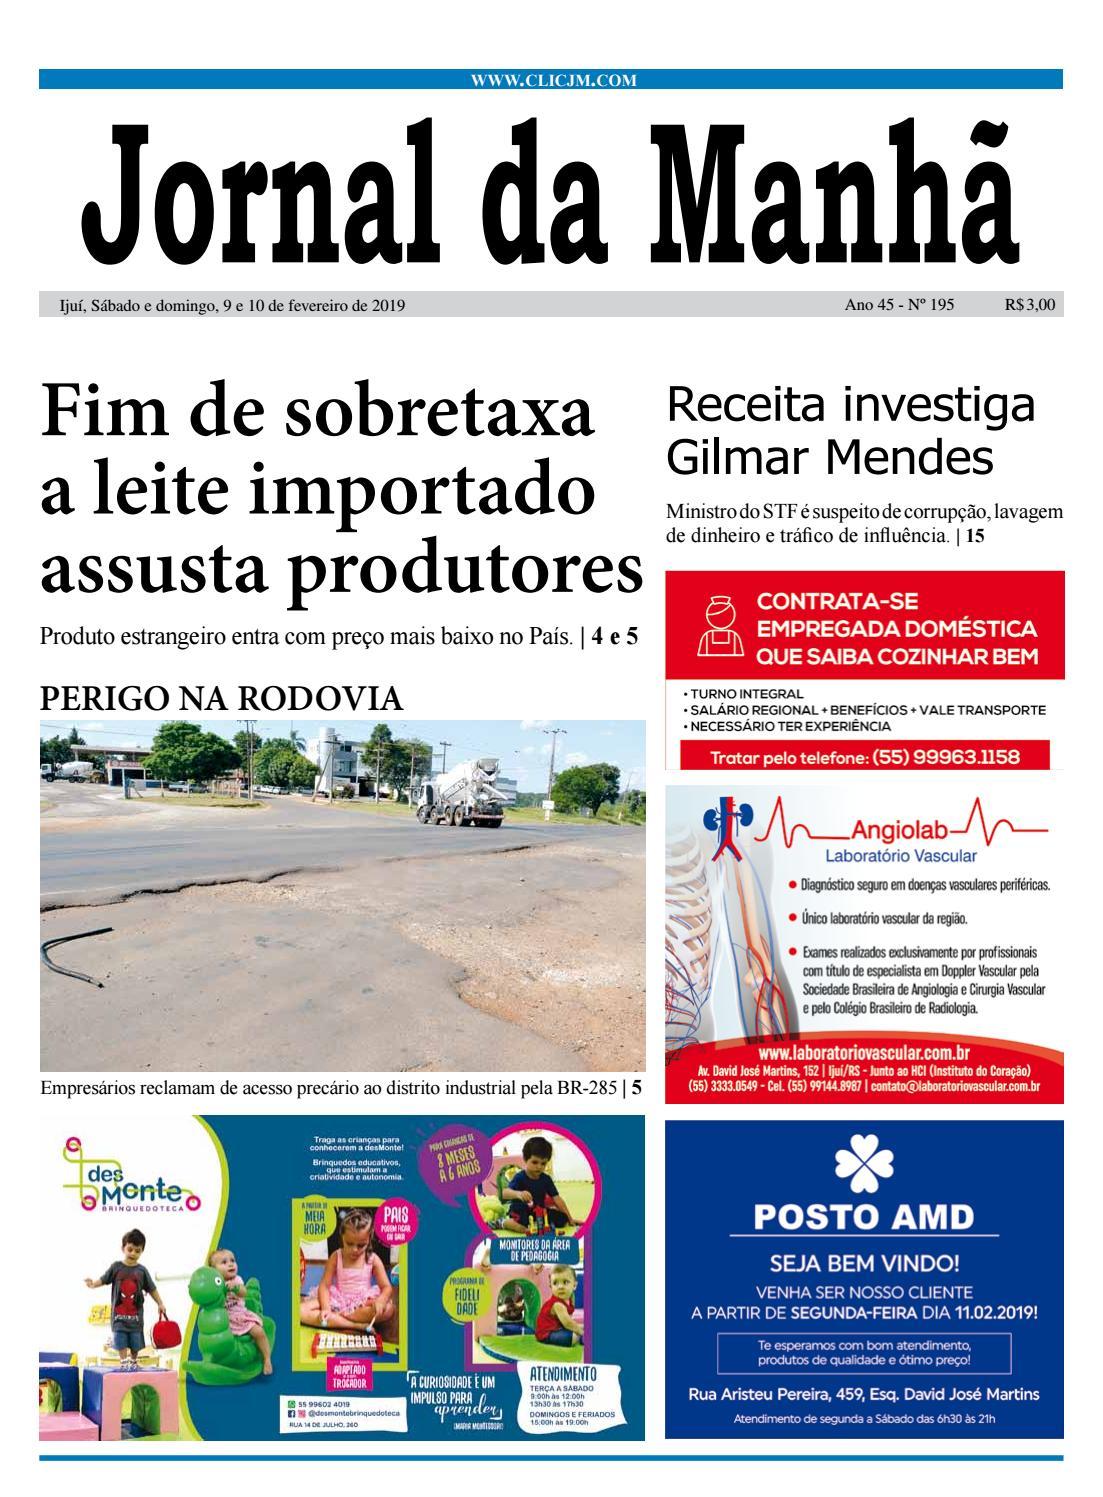 c0dc43509 Jornal da Manhã - Sábado - 09-02-2019 by clicjm - issuu